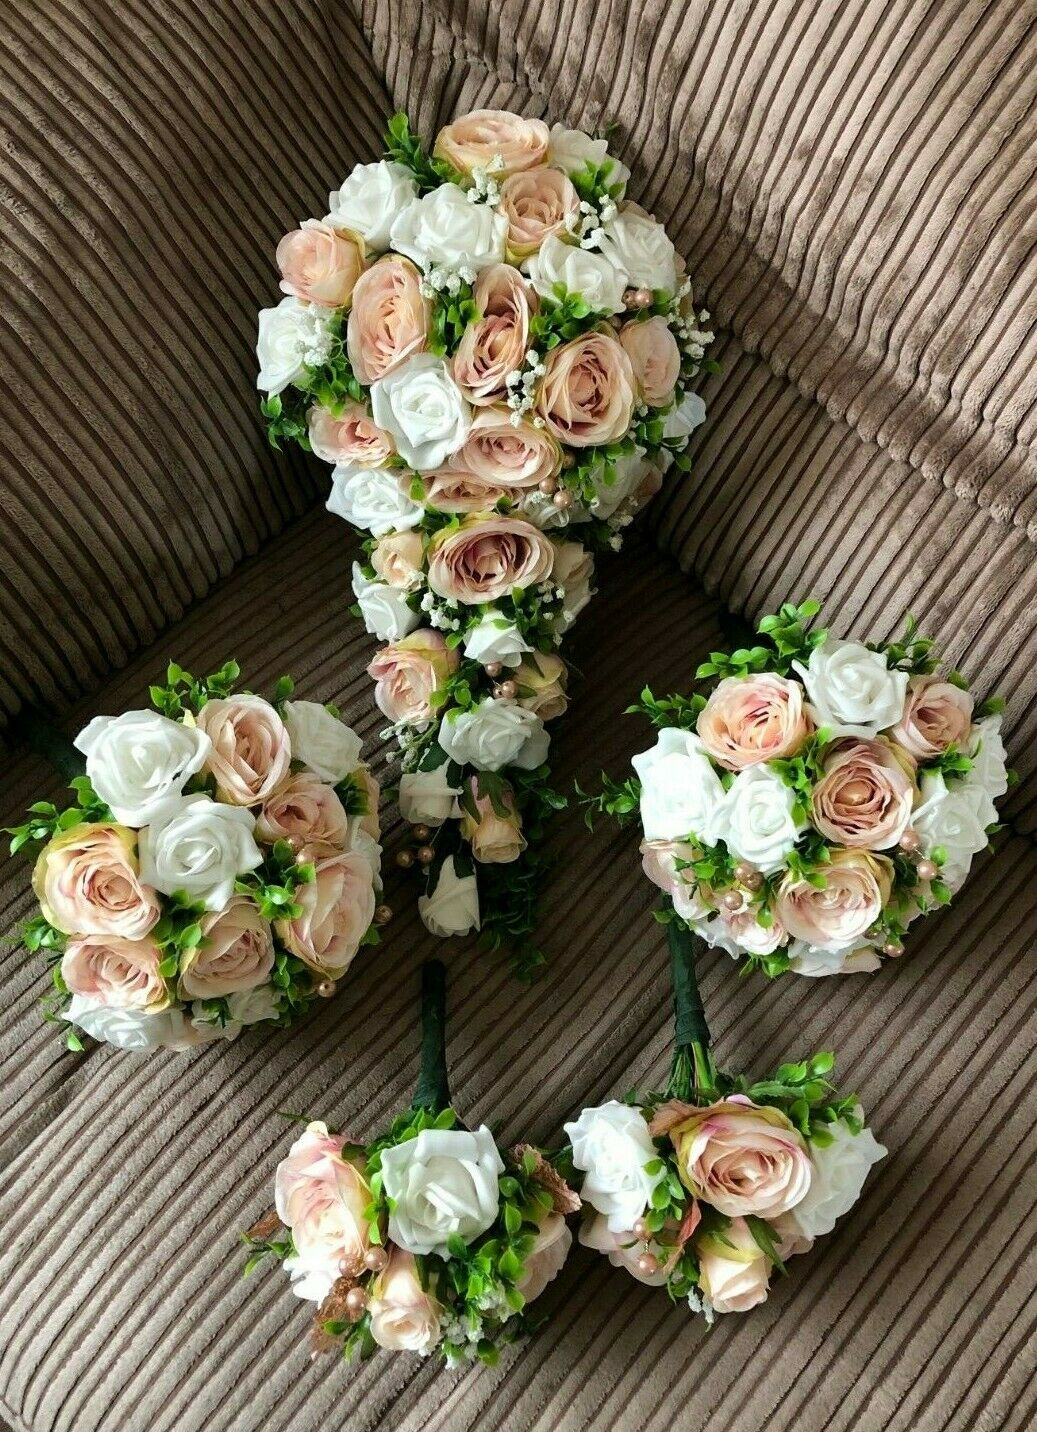 Silk Wedding Fleurs XL bridal bouquet fleur Paquet bleush Rose & Blanc